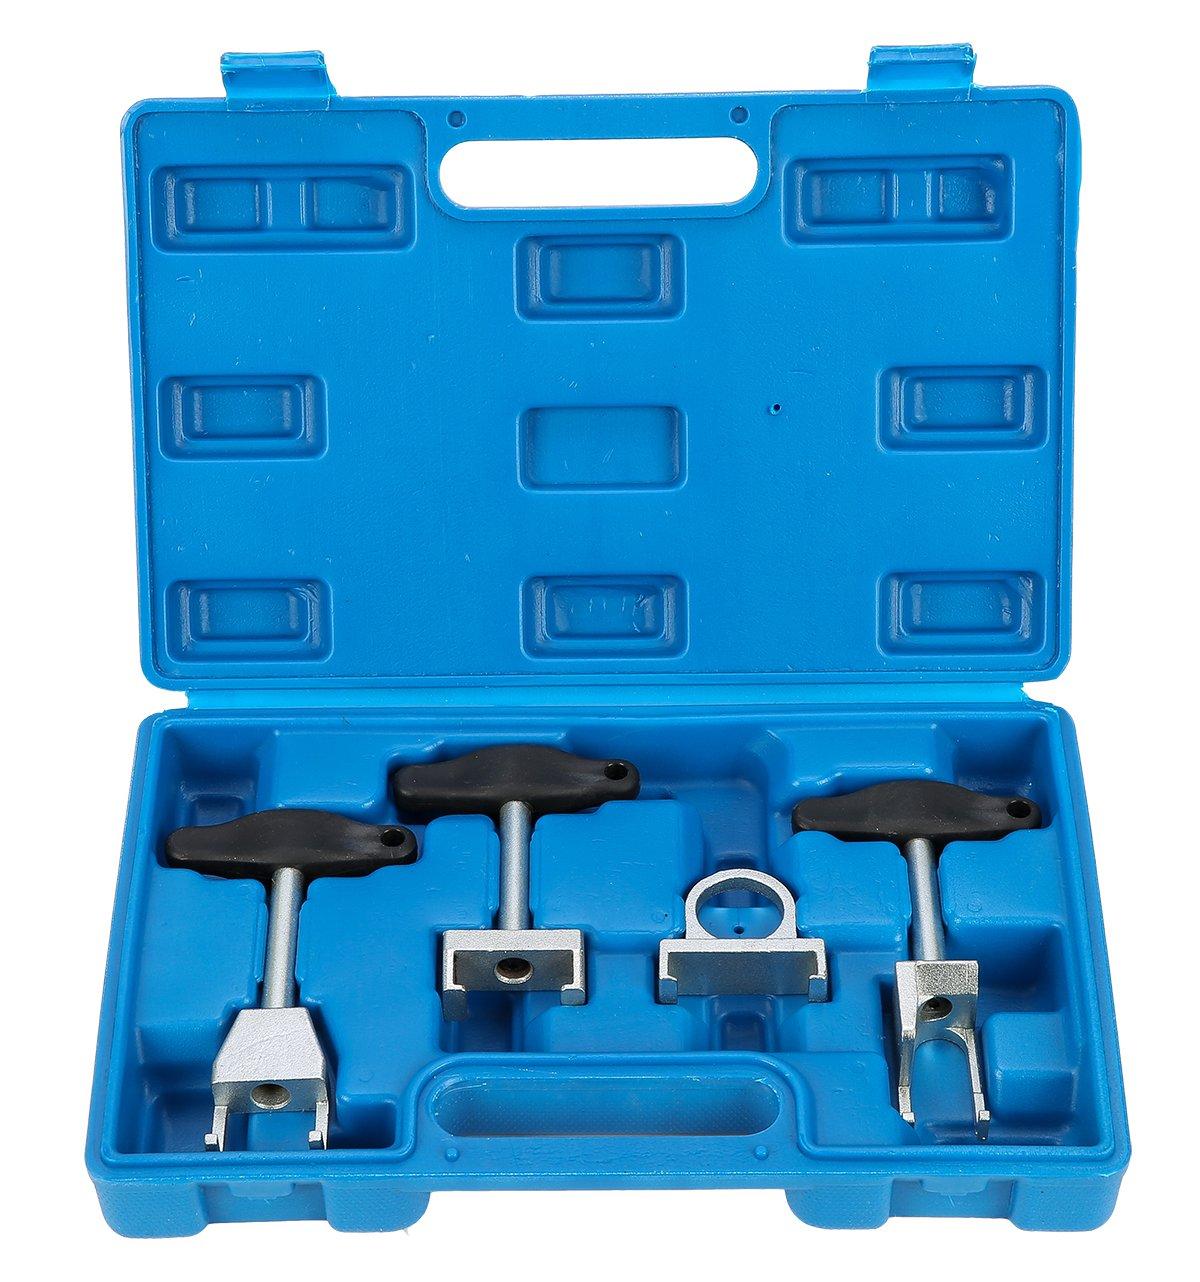 8MILELAKE 4 pcs Ignition Coil Puller Spark Plug Plug Extractor Set Car freebirdtrading